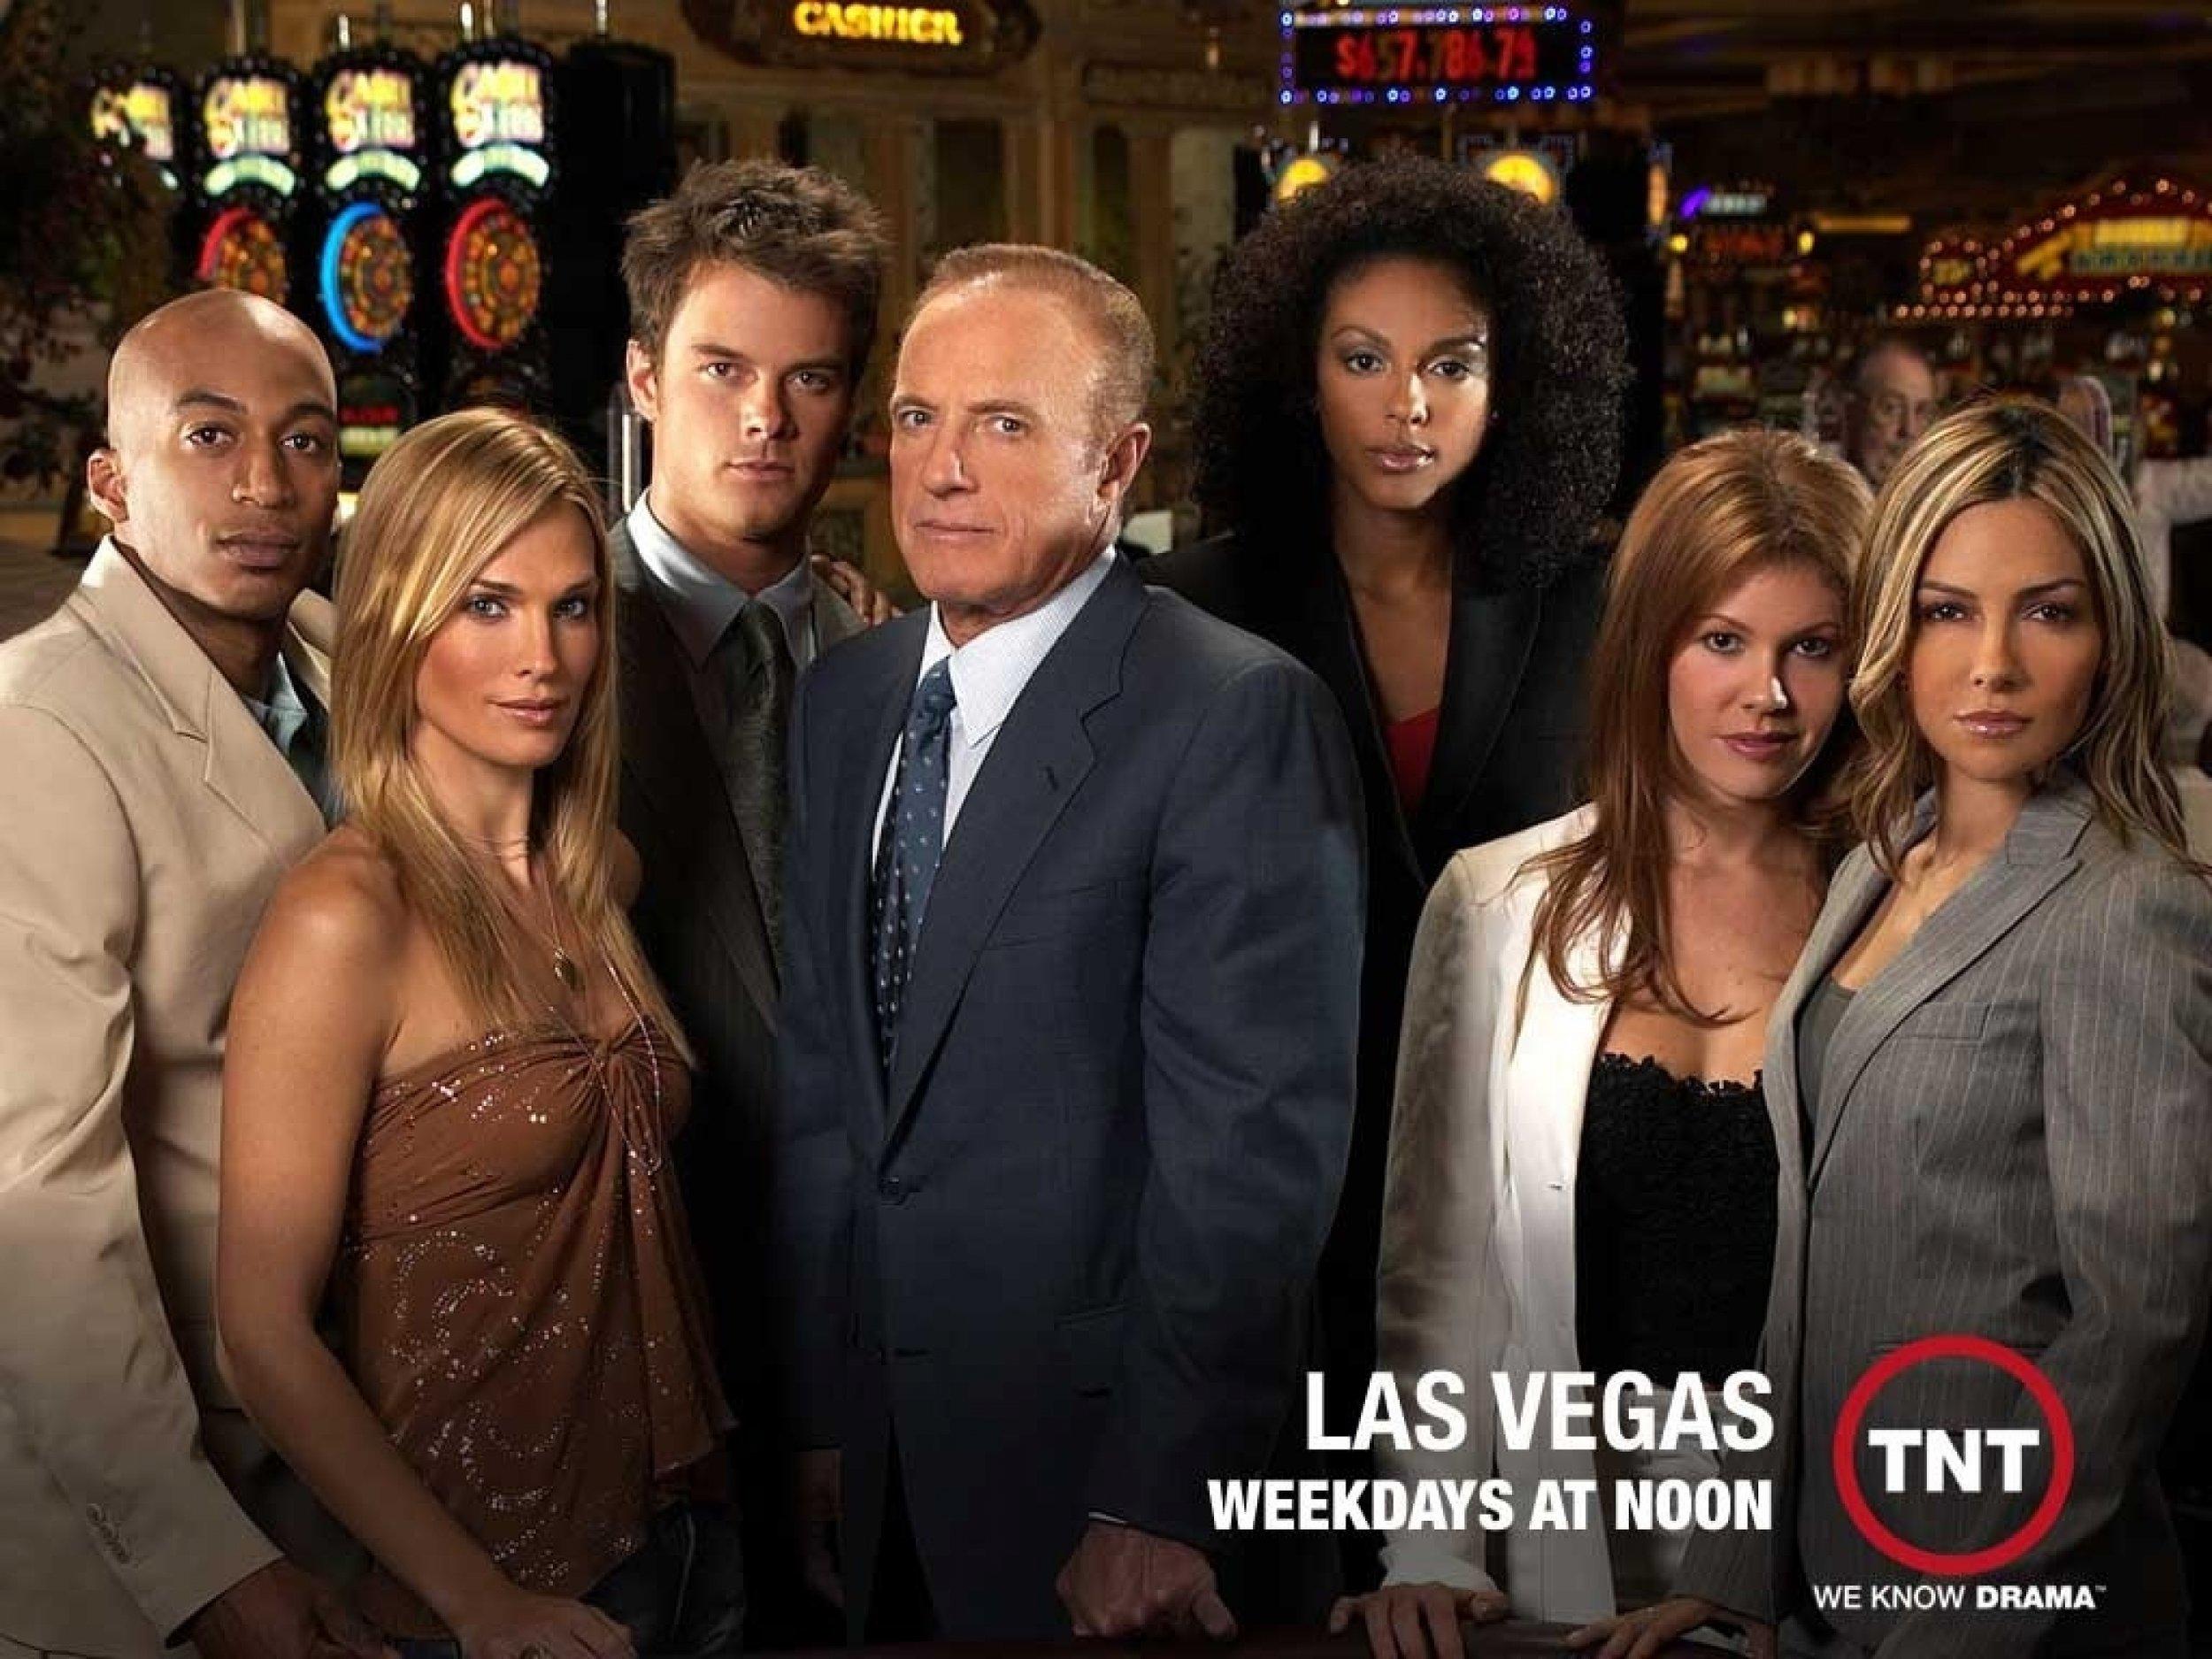 TNT TV Las Vegas Series Cast - Molly Sims